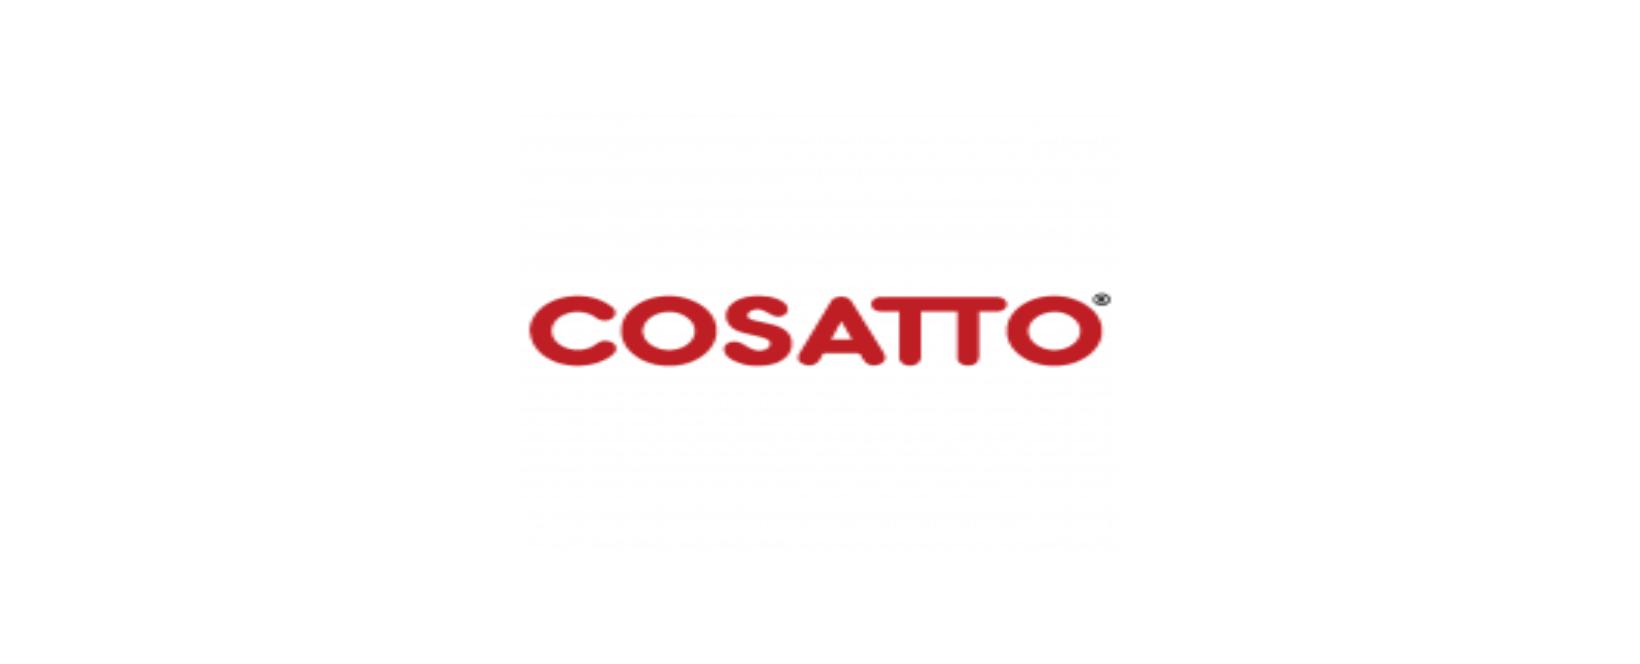 Cosatto UK Discount Code 2021